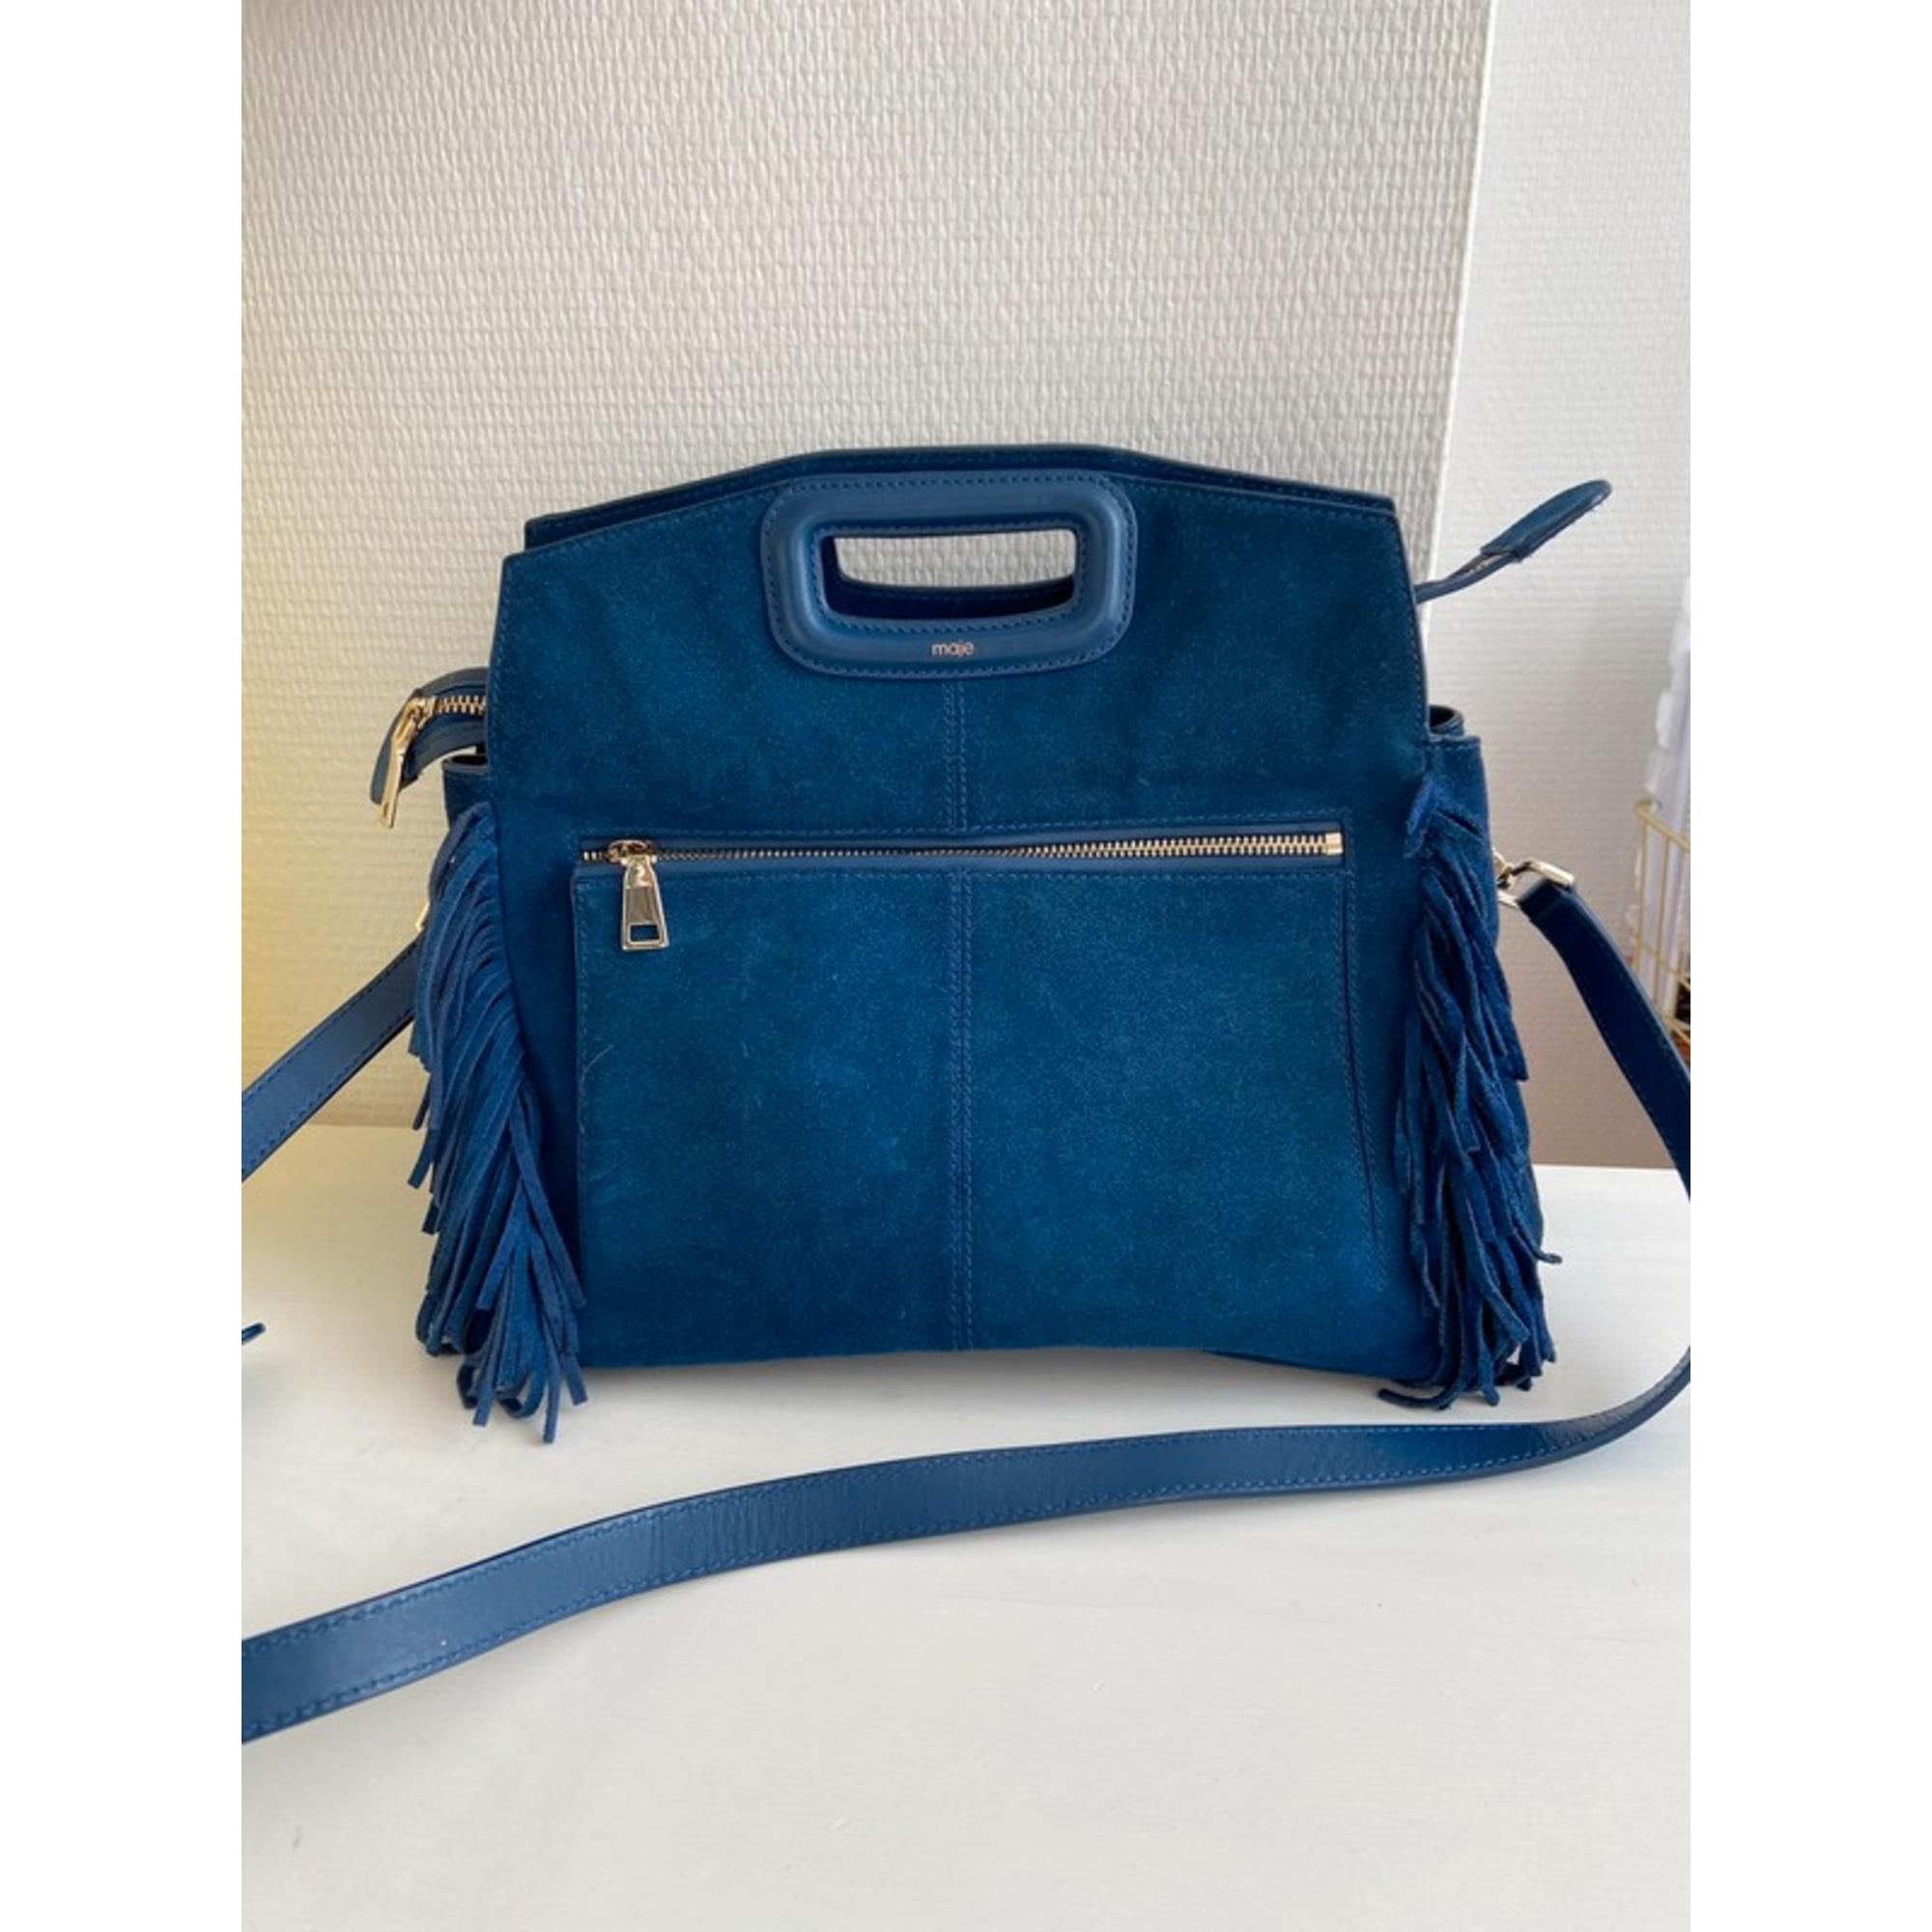 Sac en bandoulière en cuir MAJE M Bleu, bleu marine, bleu turquoise